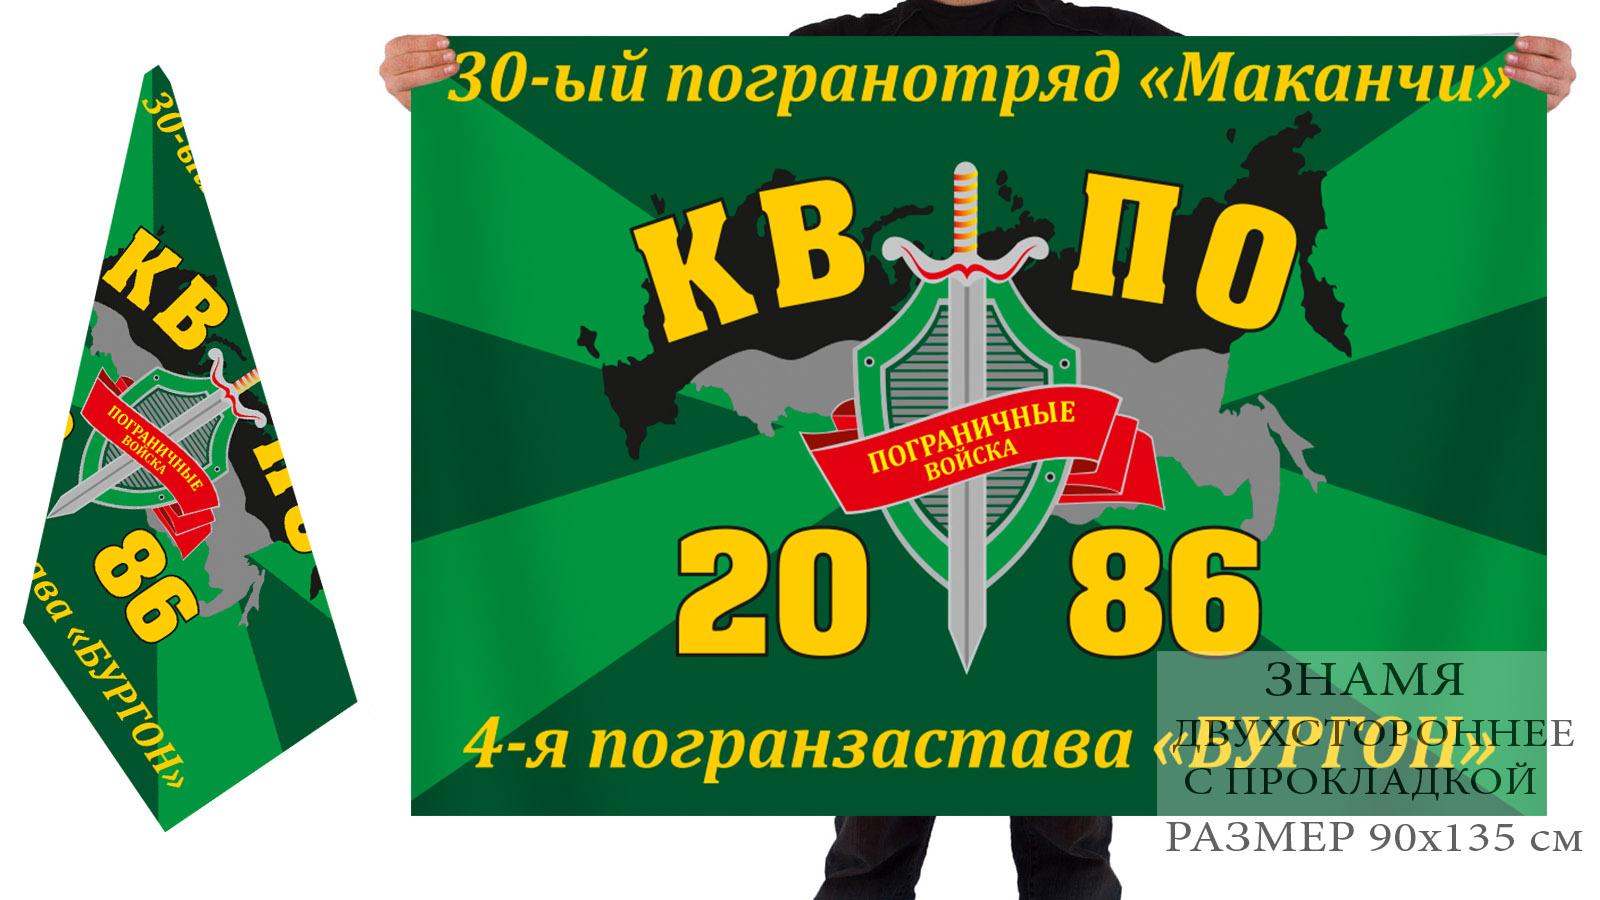 "Двусторонний флаг 30 Маканчинского погранотряда 4 пограничная застава ""Бургон"""